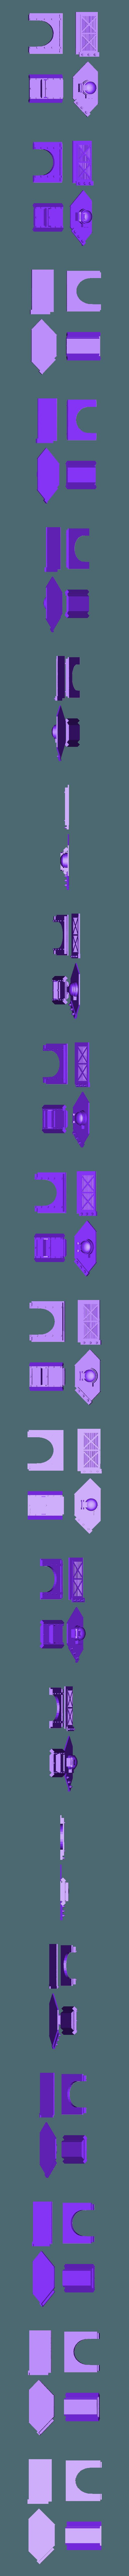 big_turret_walls_2.stl Download free STL file Big Plasma Cannon Turret • 3D printing design, JtStrait72